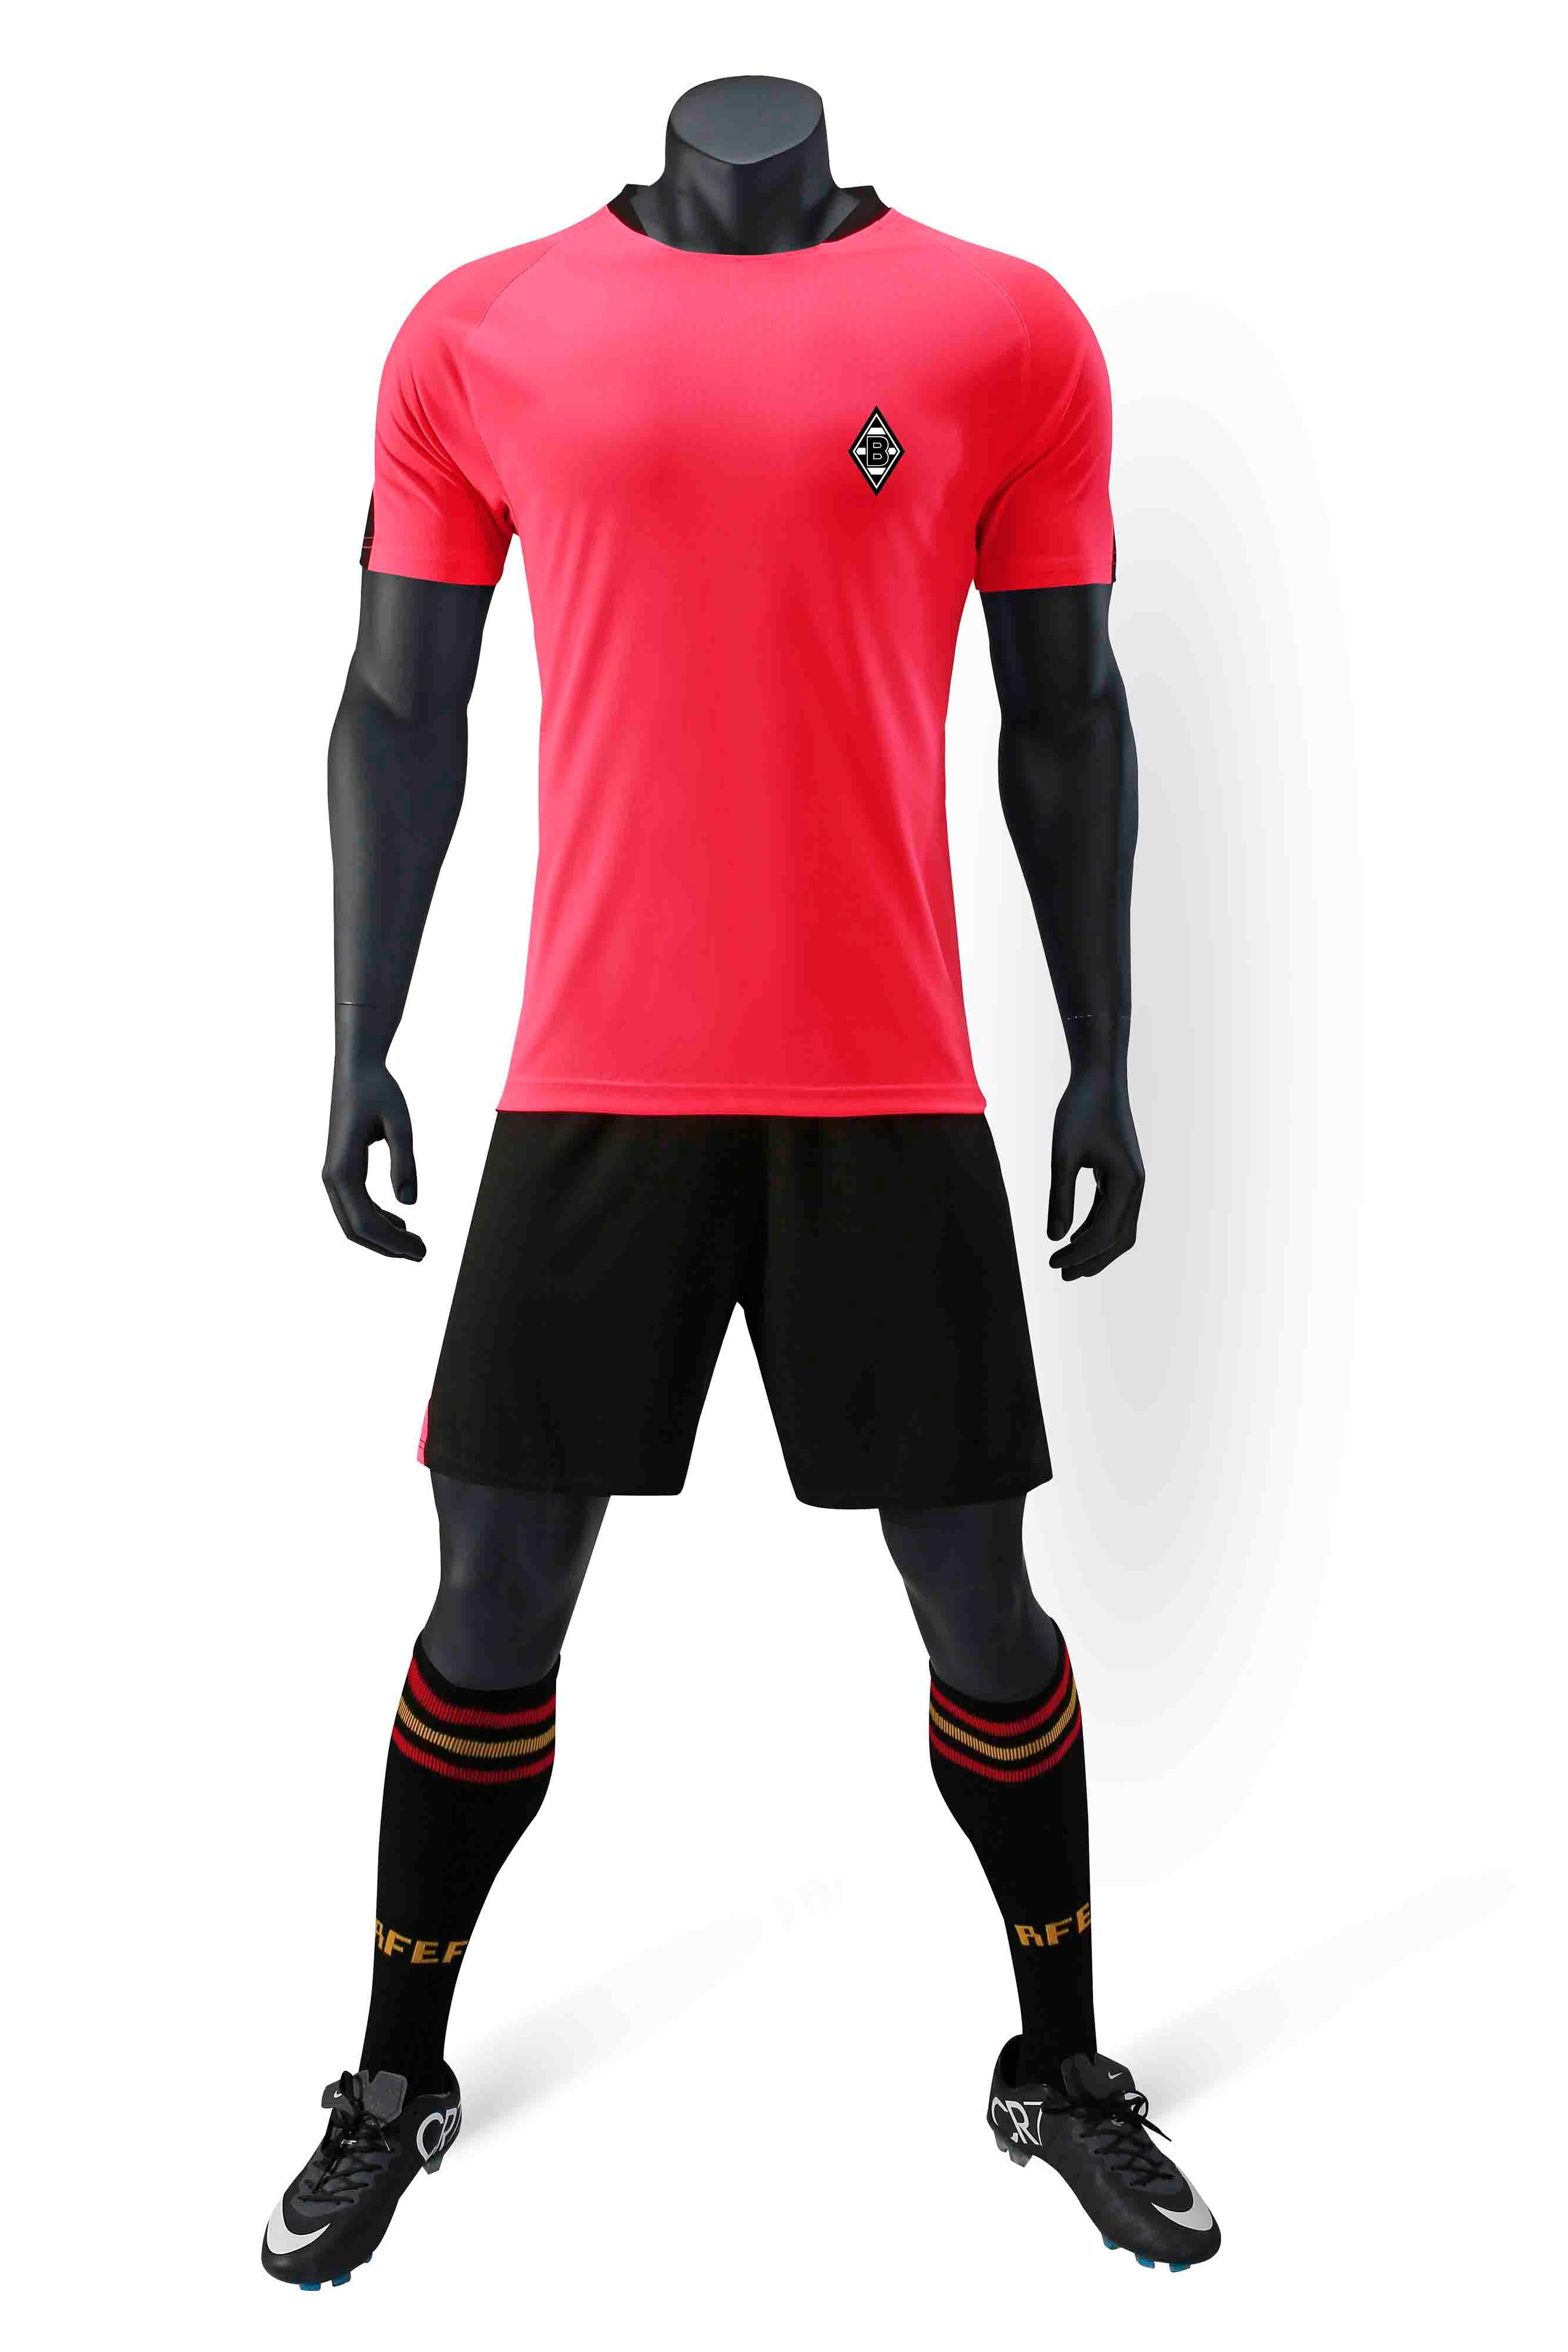 VFL Borussia Mönchengladbach 100% Polyester Spor Yeni Desen Rahat T-Shirt Futbol Eşofman Eğitimi Trendy Erkek Futbol Eşofman